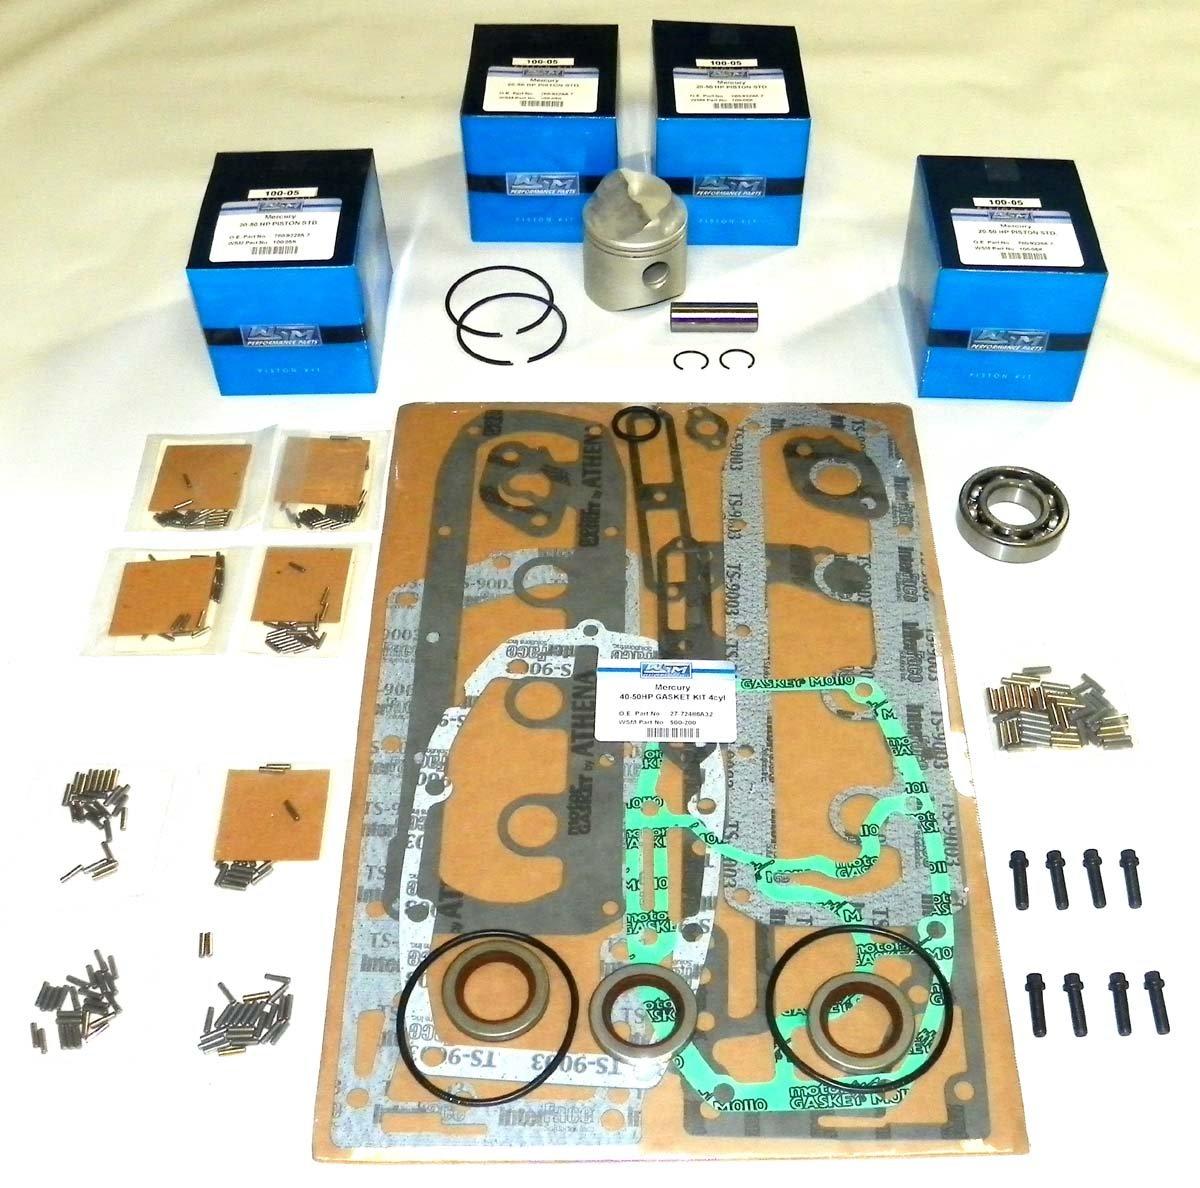 Mercury 40 Hp 1990-1997, 45 Hp 1986-1989, 50 Hp 1970-1985 4 Cylinder Power Head Rebuild Kit PWC 100-05-10 Piston OEM# 743-5172A, 743-5172A6, 780-9229A (.020'' (2.585''))